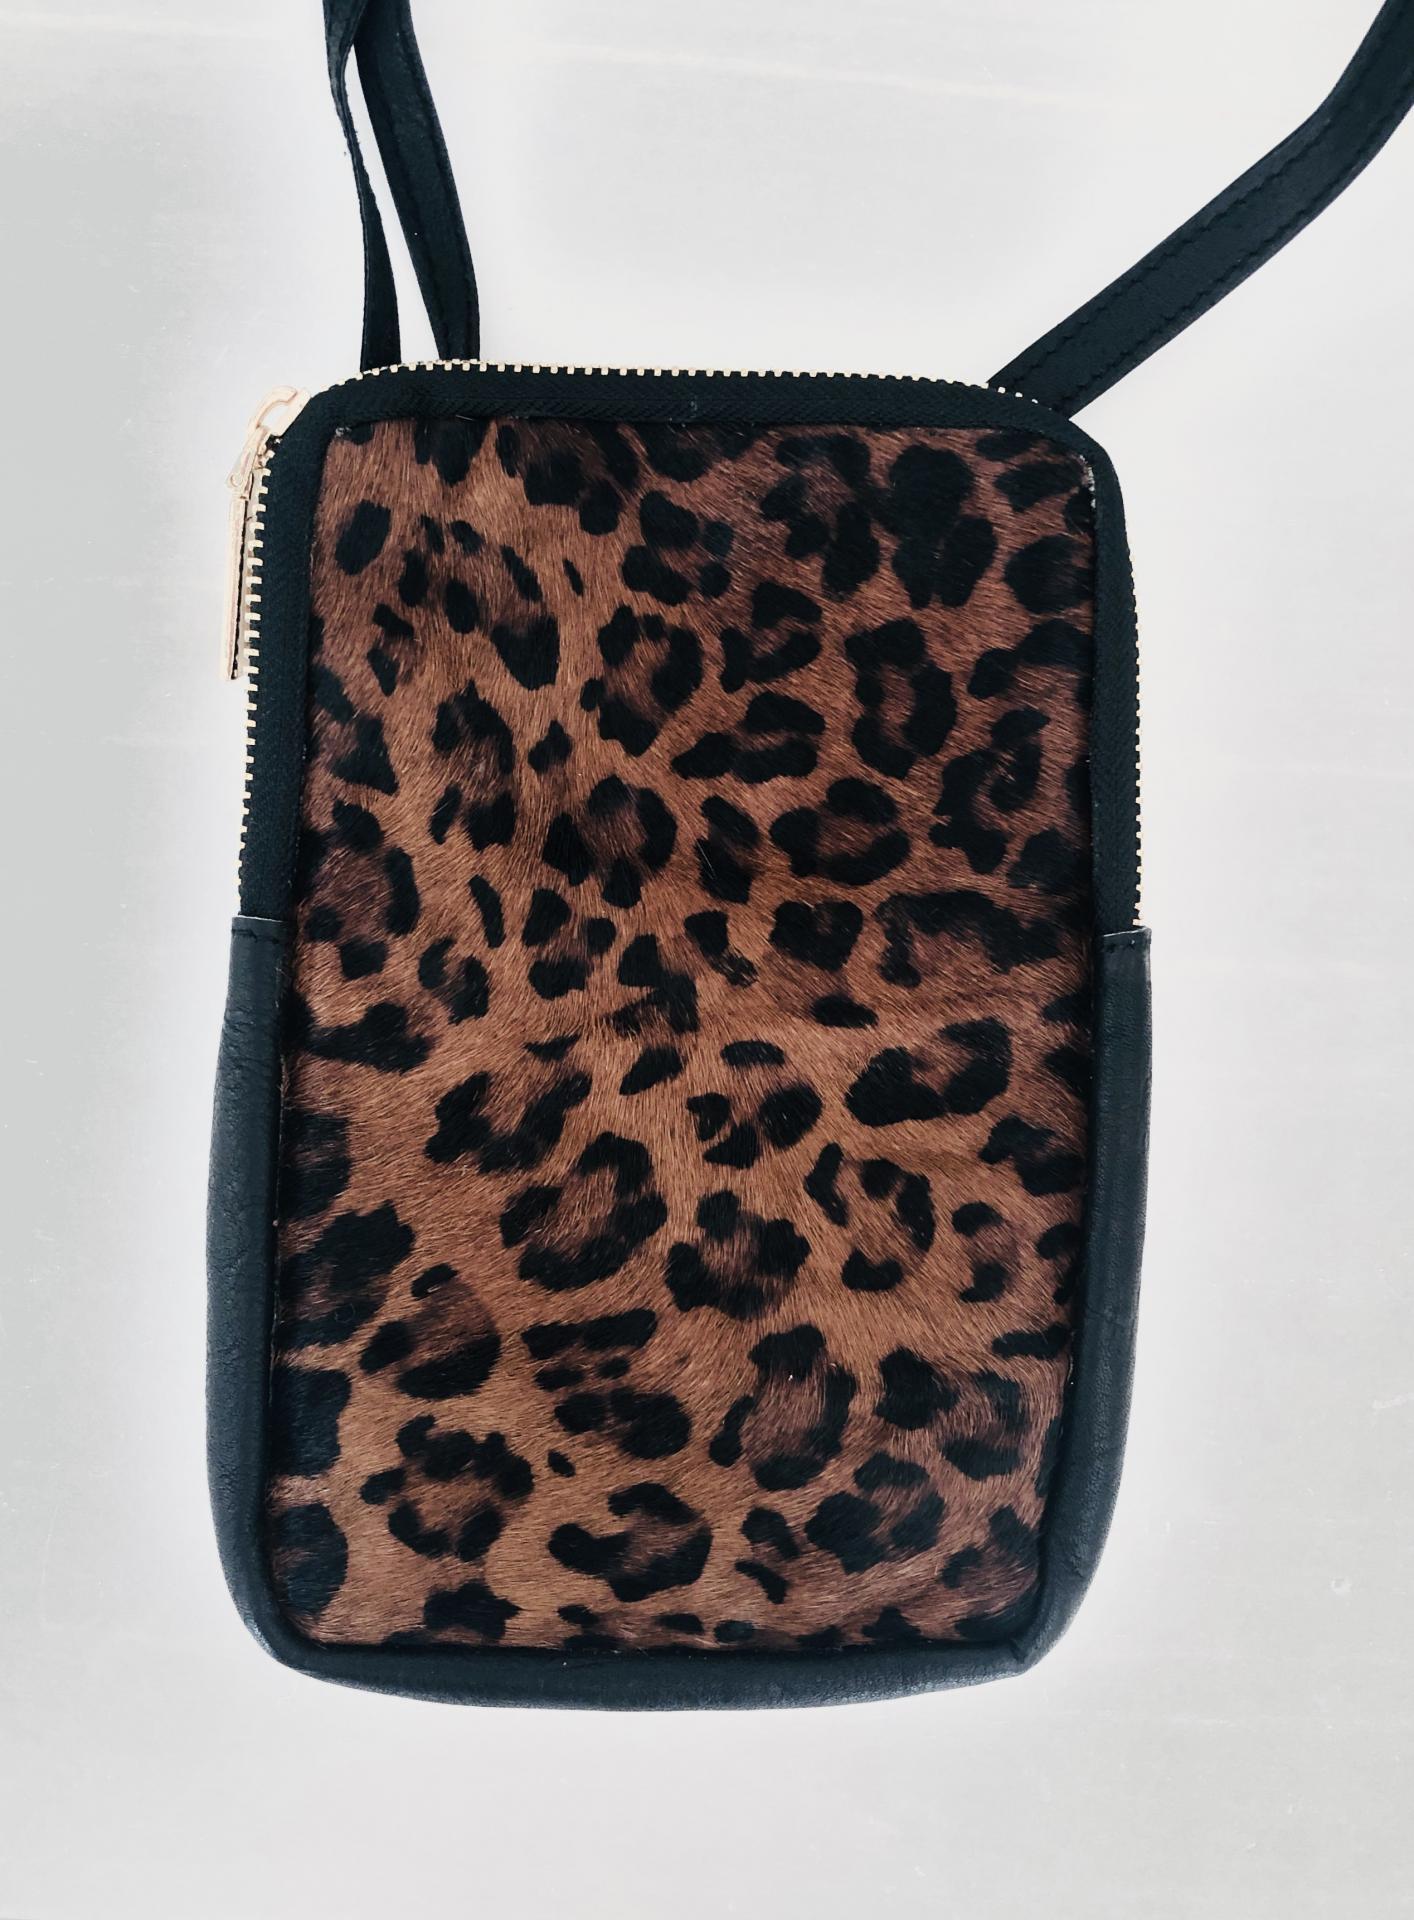 Bolos rectangular animal print color marrón